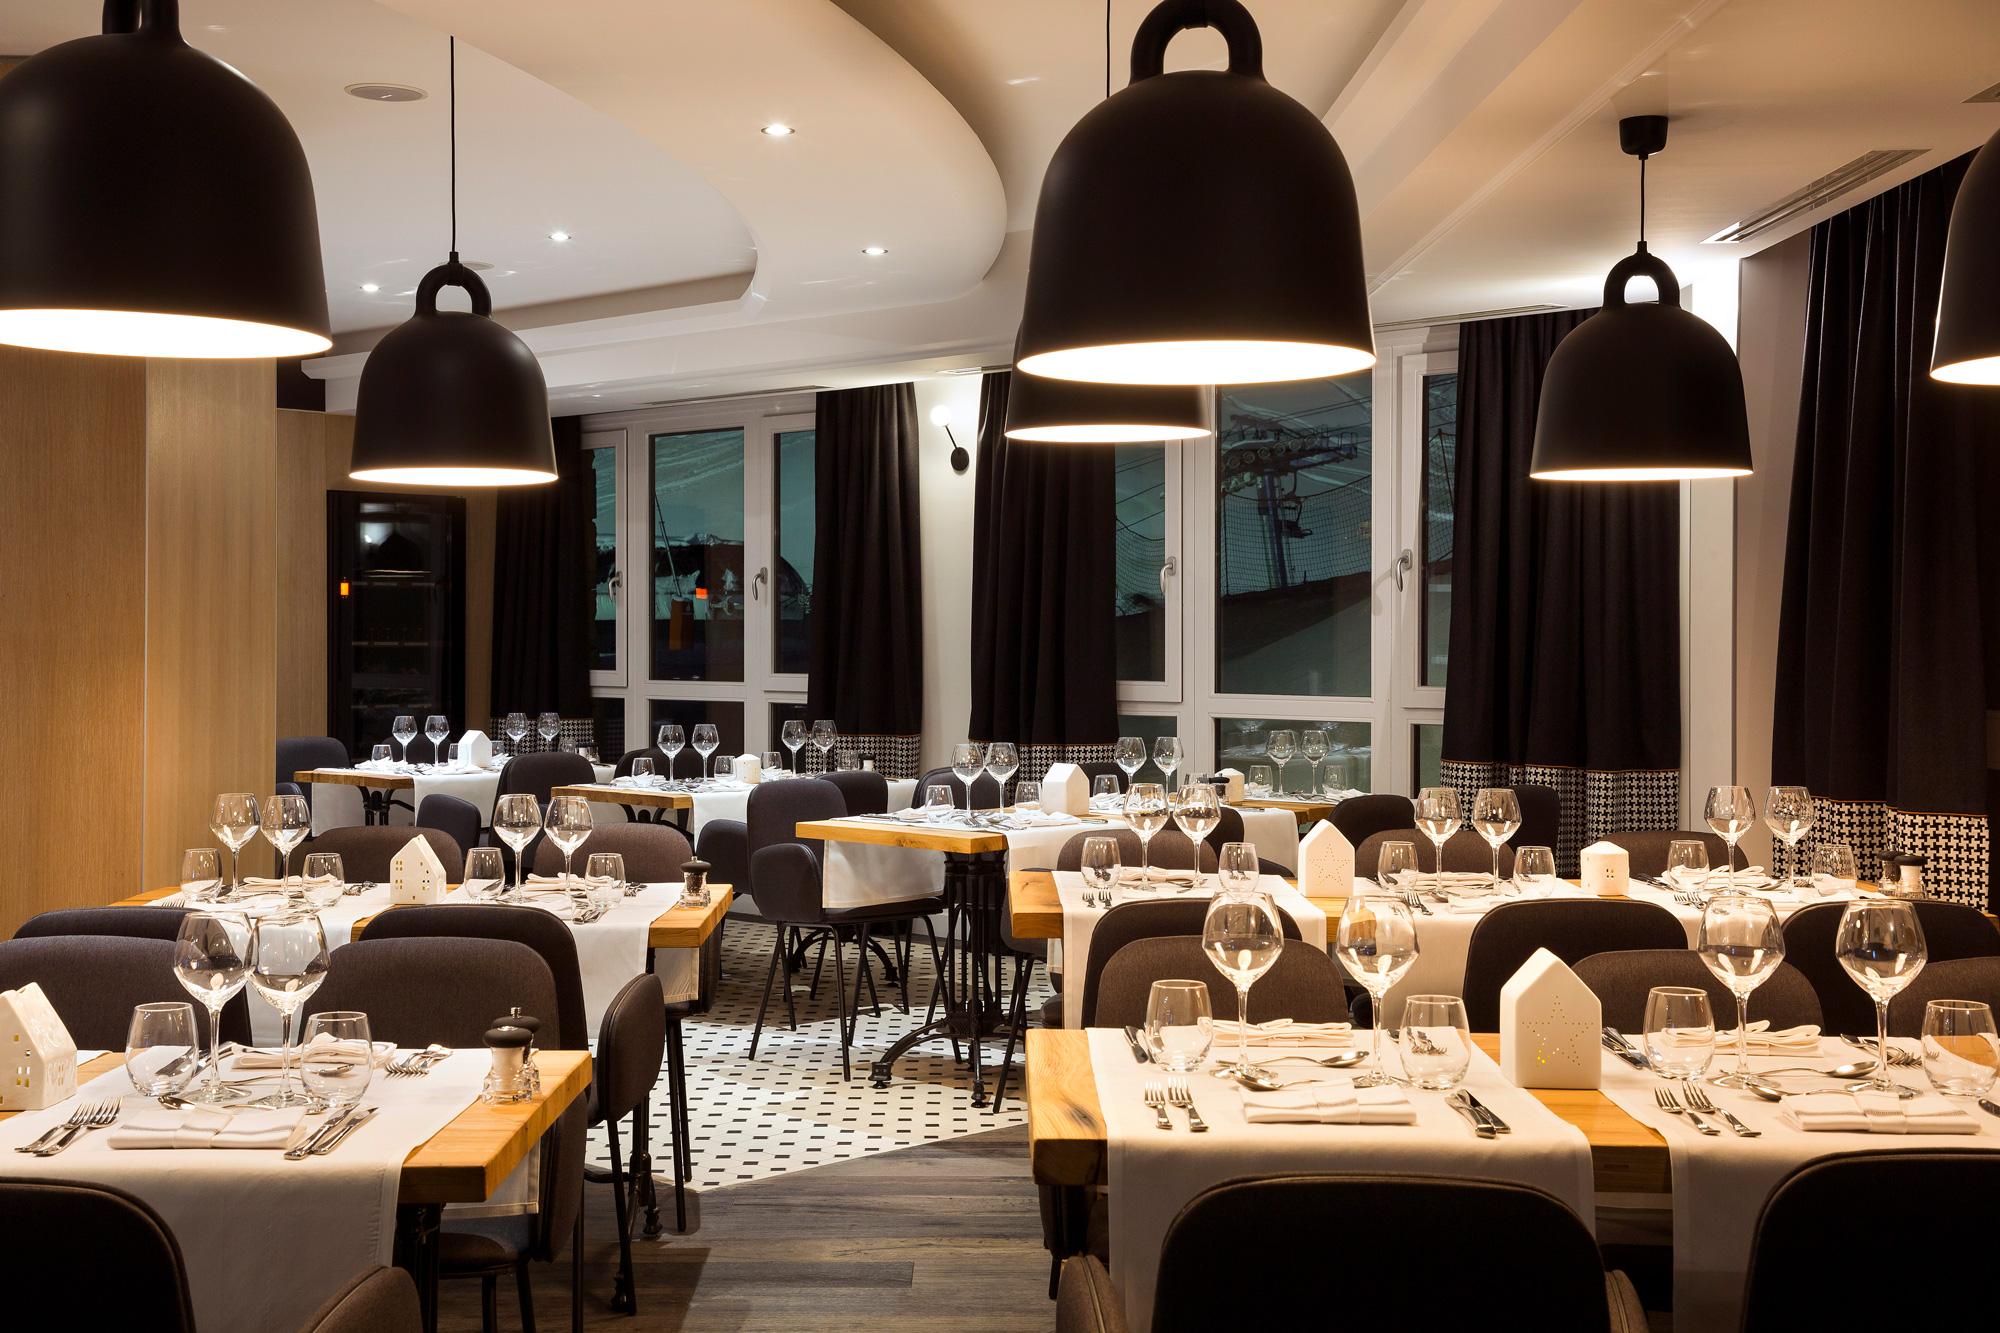 7-Araucaria-Hotel-Spa-Restaurant-HD